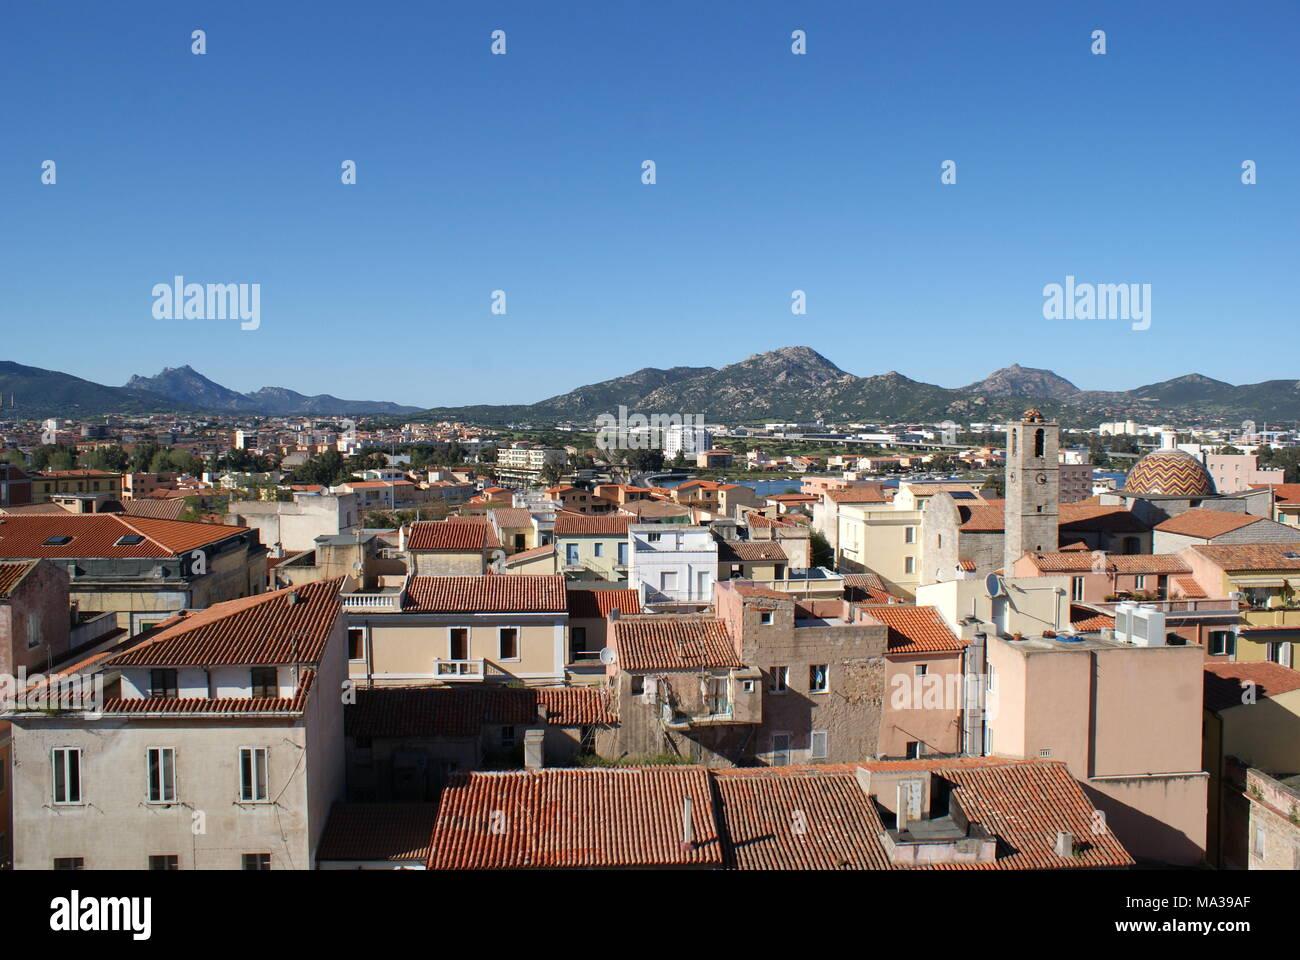 Rooftop view of the city of Olbia, Olbia, Sardinia, Italy - Stock Image